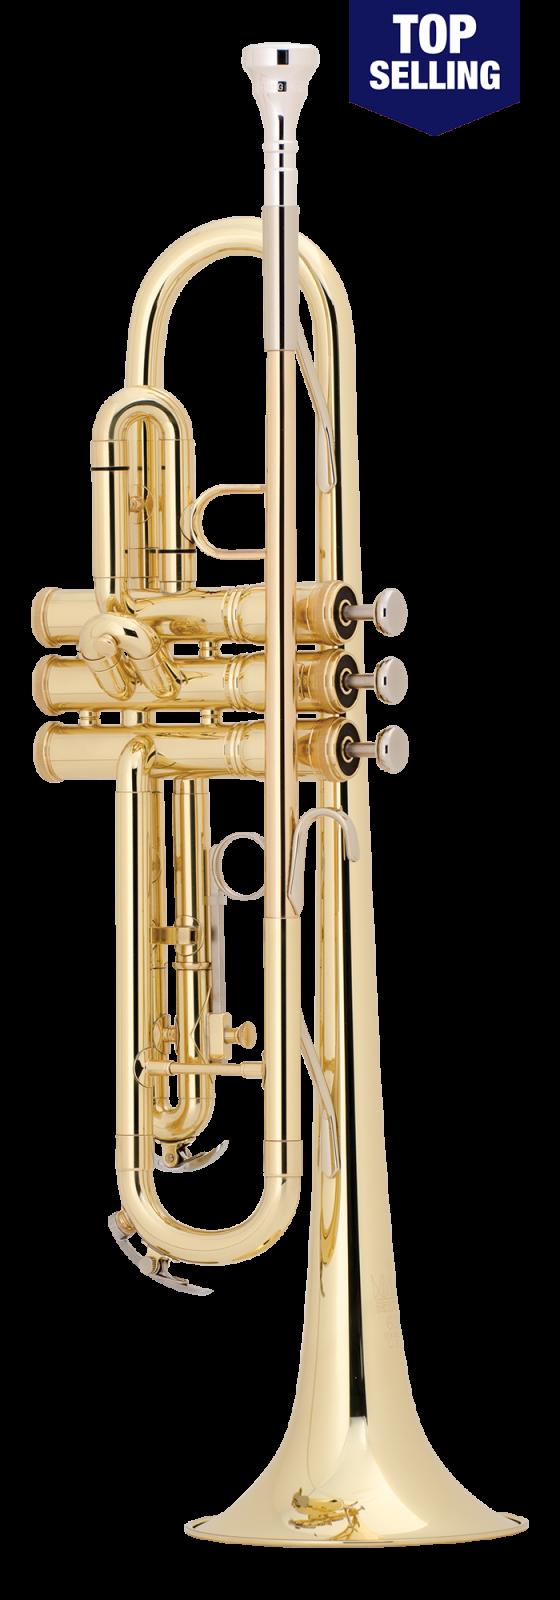 King 601 Student Trumpet NEW